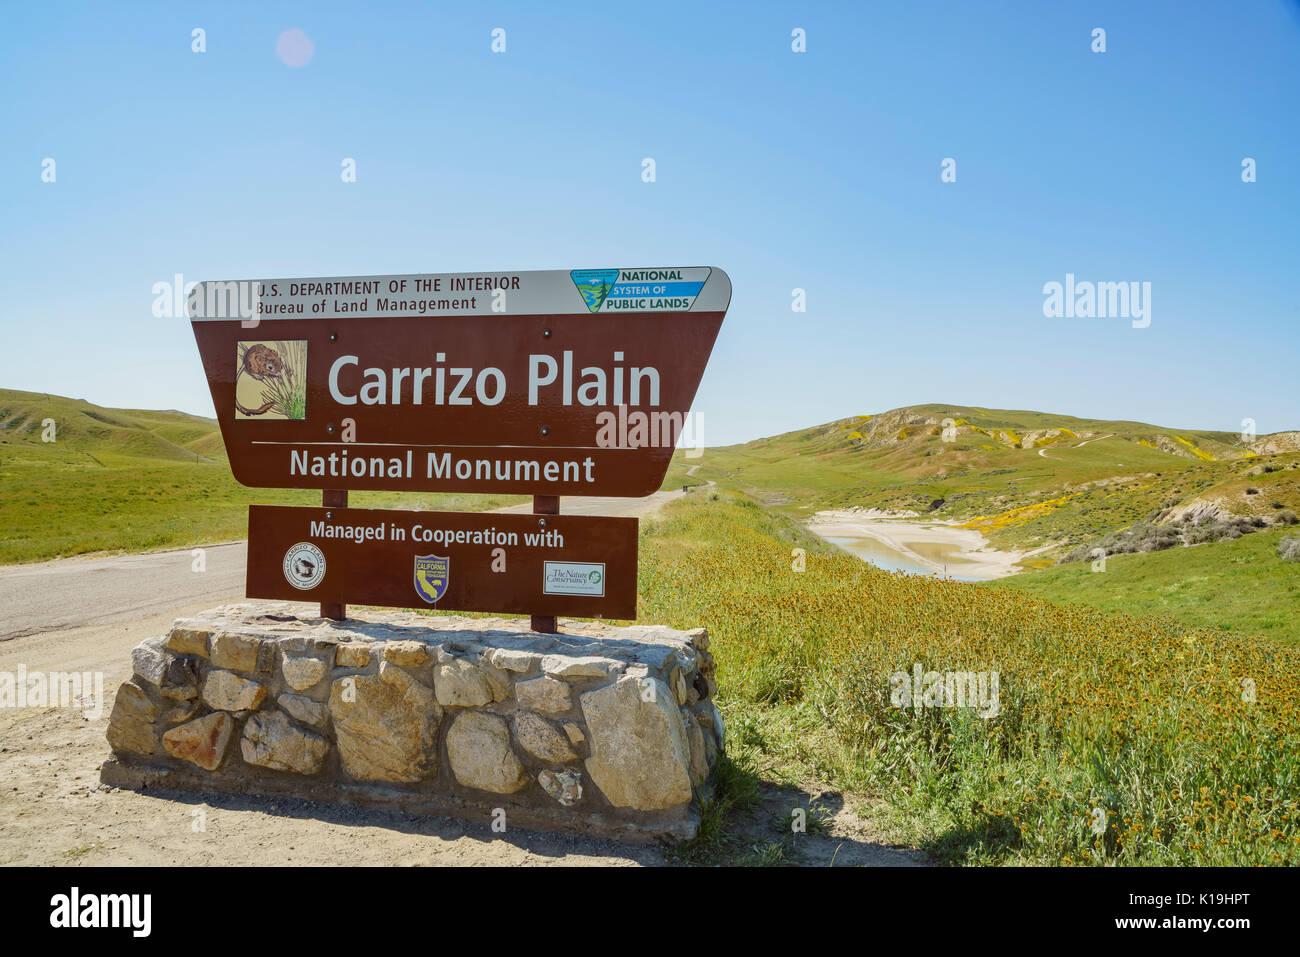 Entrance sign of Carrizo Plain National Mounment, California, U.S.A. - Stock Image